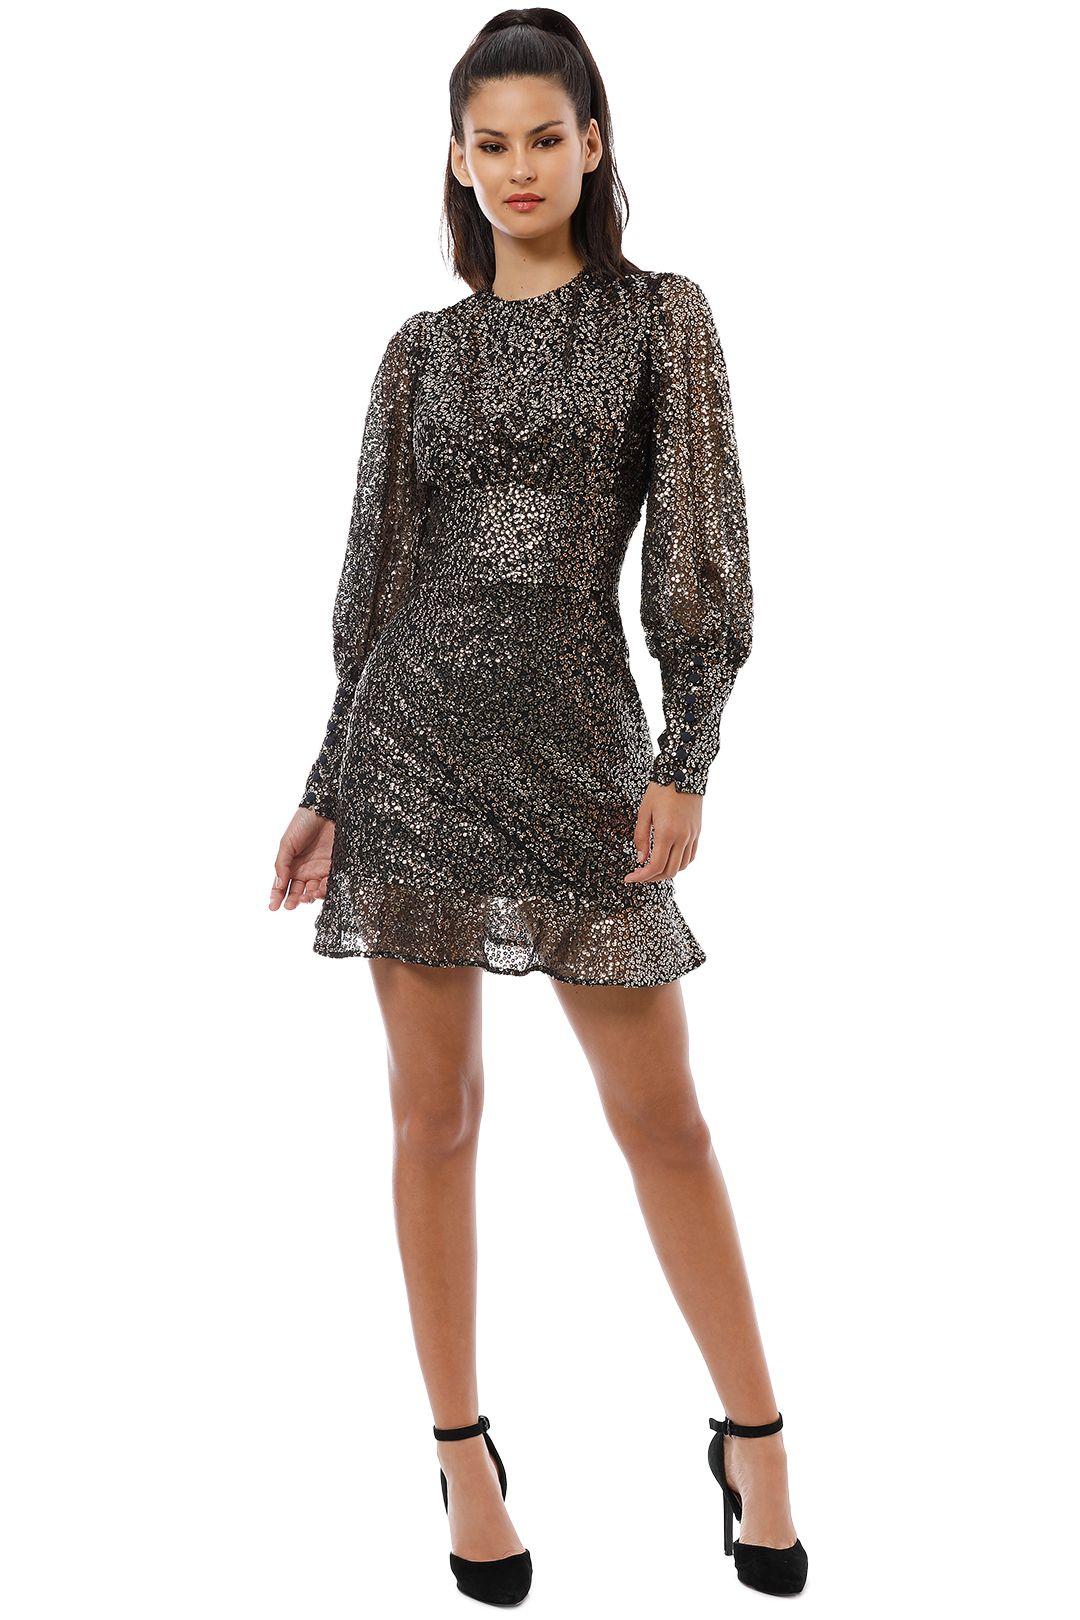 Misha Collection - Brielle Mini Dress - Black Gold - Front